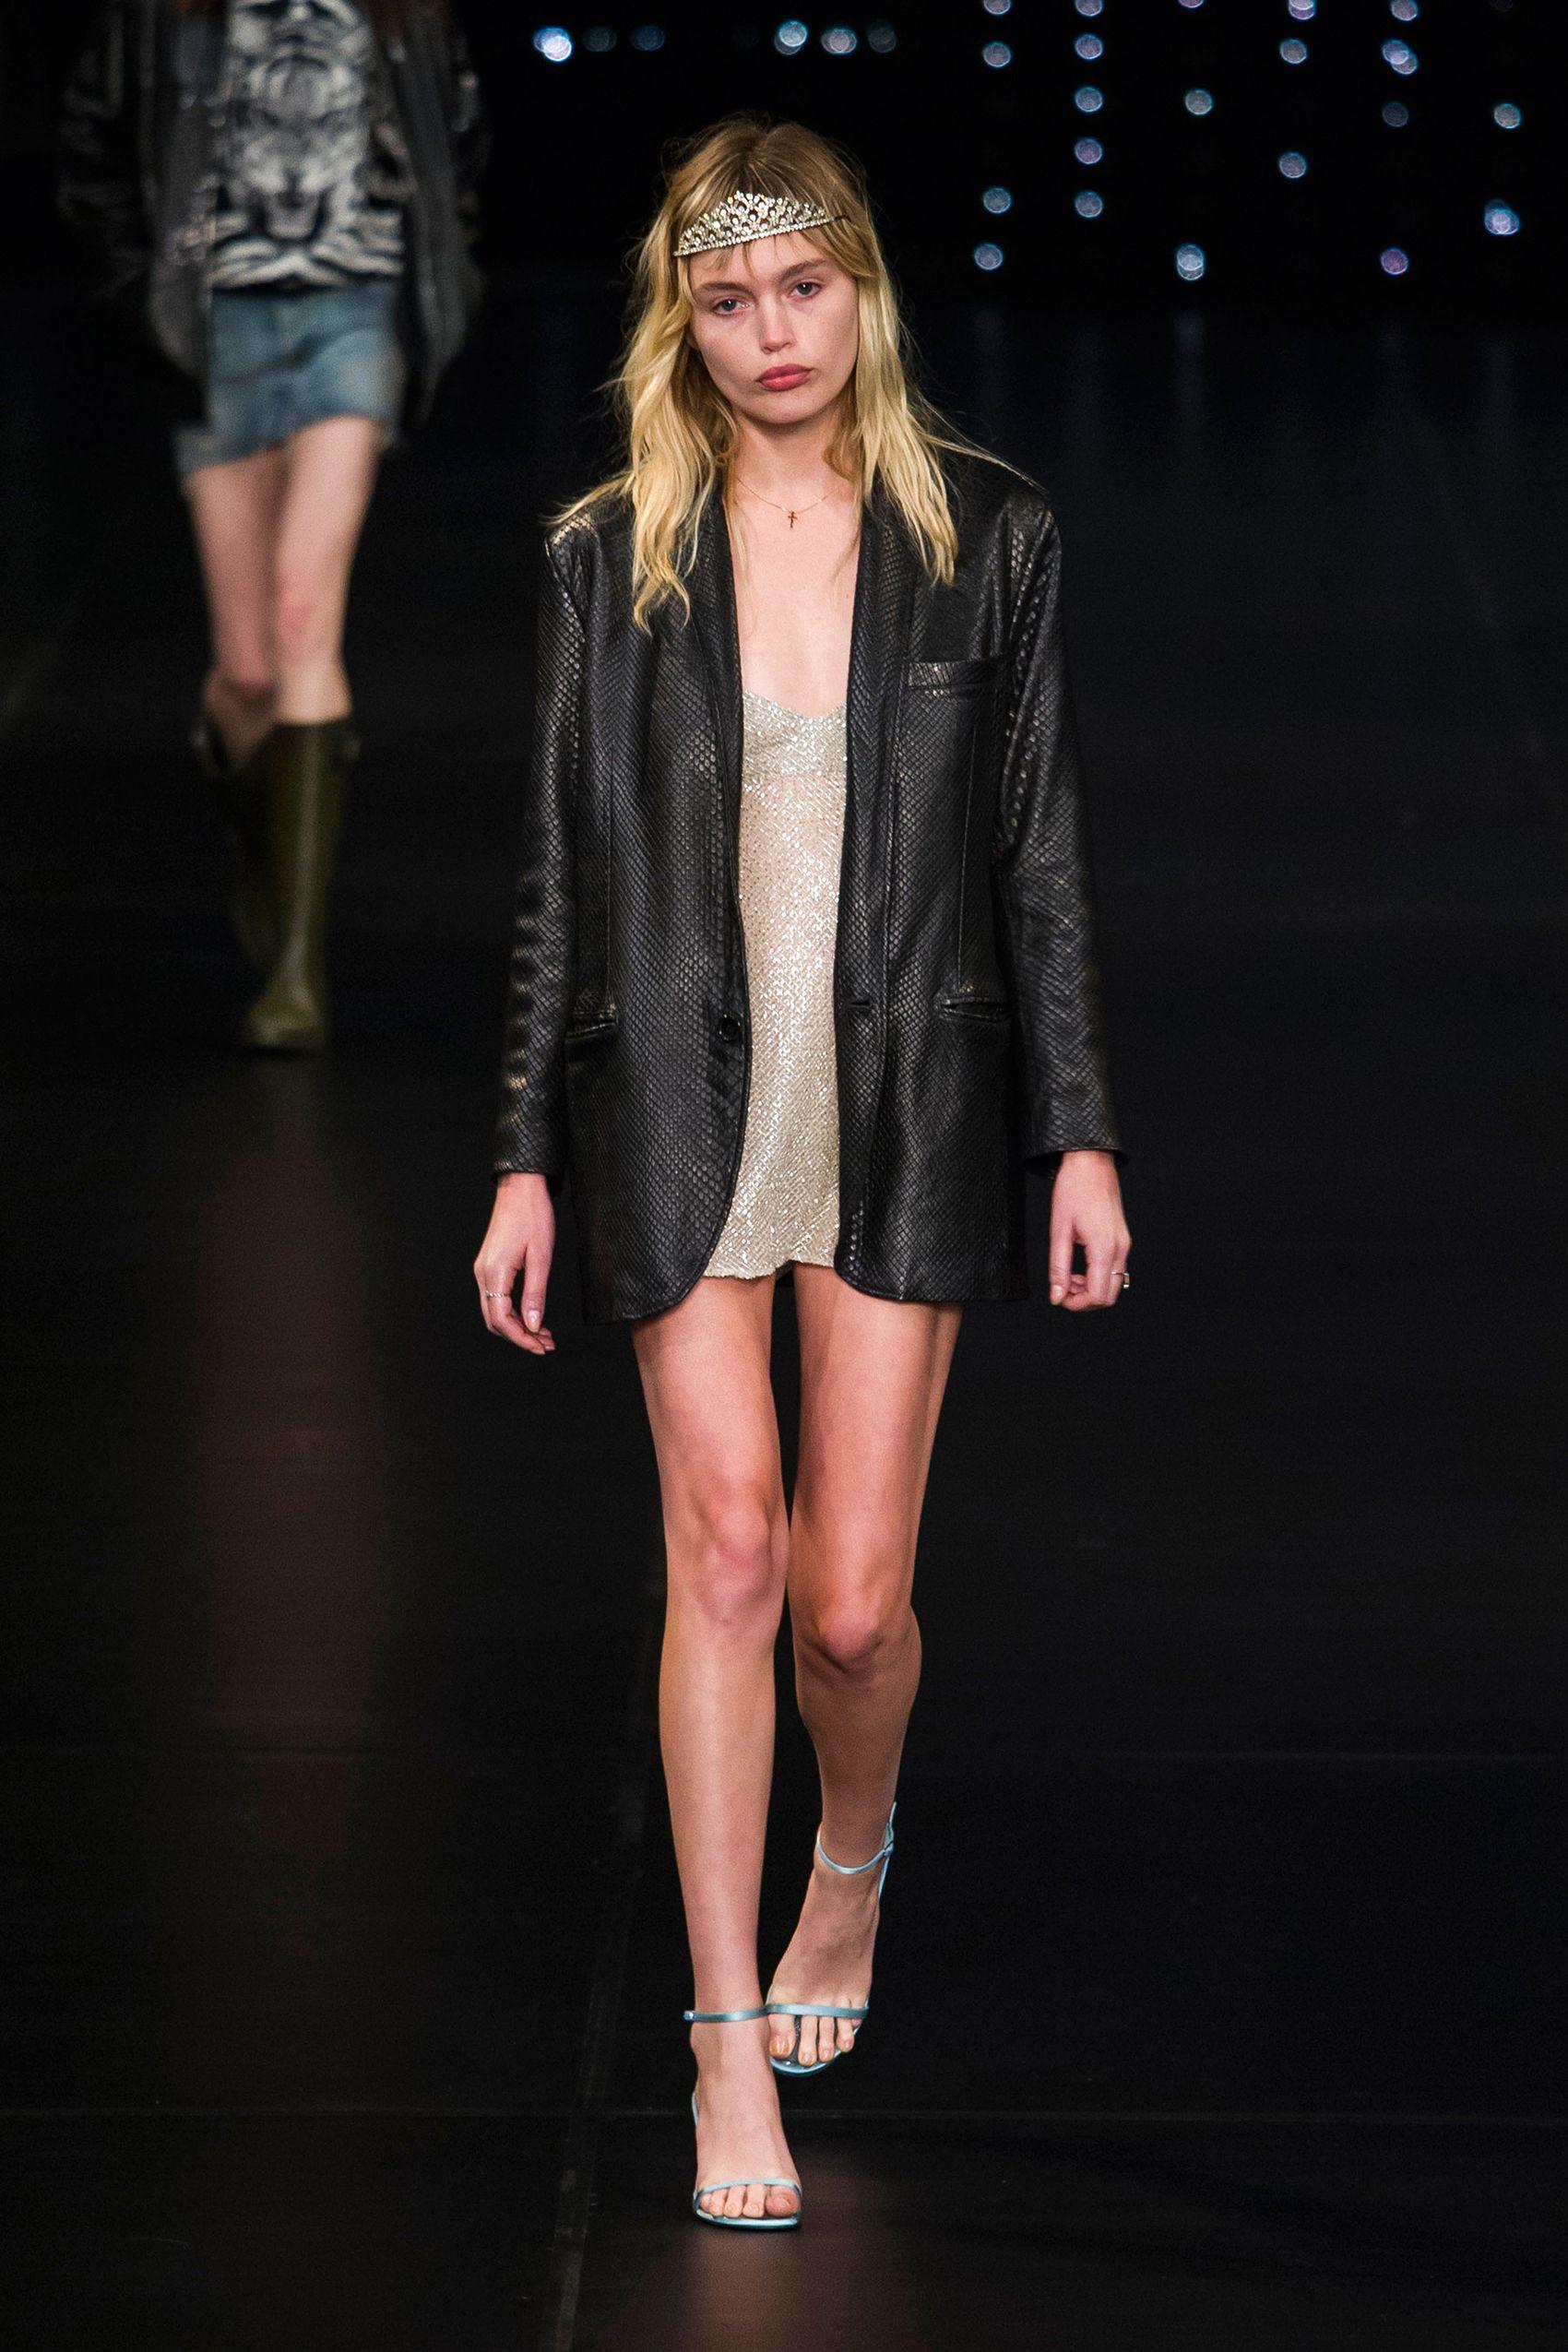 80d4d2714e1 Best Runway Fashion at Paris Fashion Week Spring 2016 - Paris Fashion Week  Spring 2016 Runway Trends